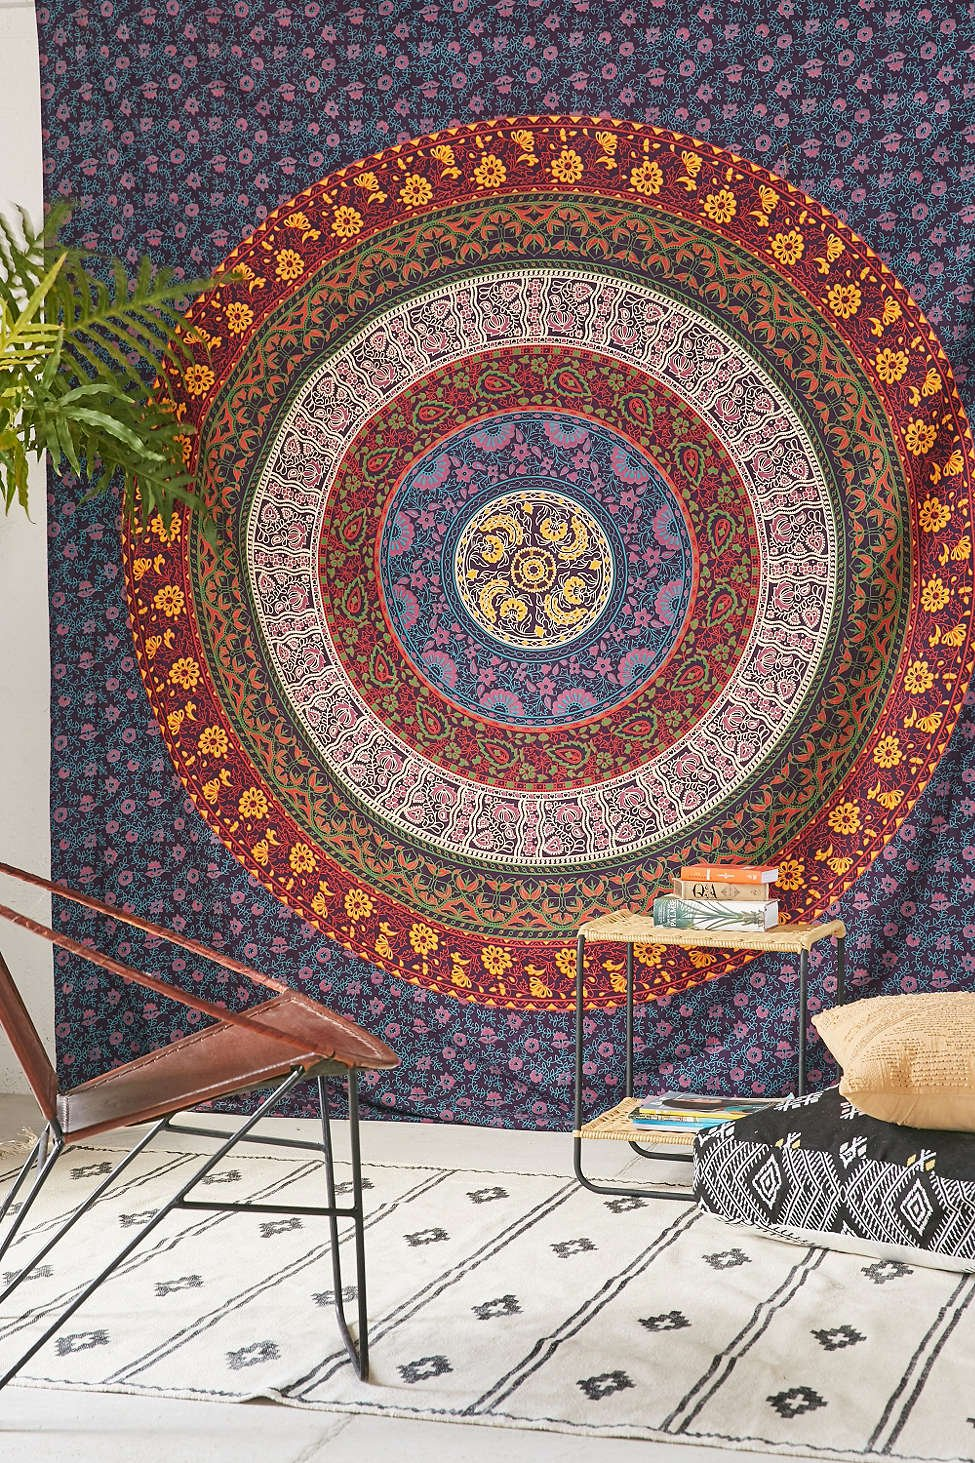 4Rissa Indian Mandala Plum /& Bow Medallion Tapestry Bedspread Boho Bohemian Chic Bedding Wall Hanging Decor